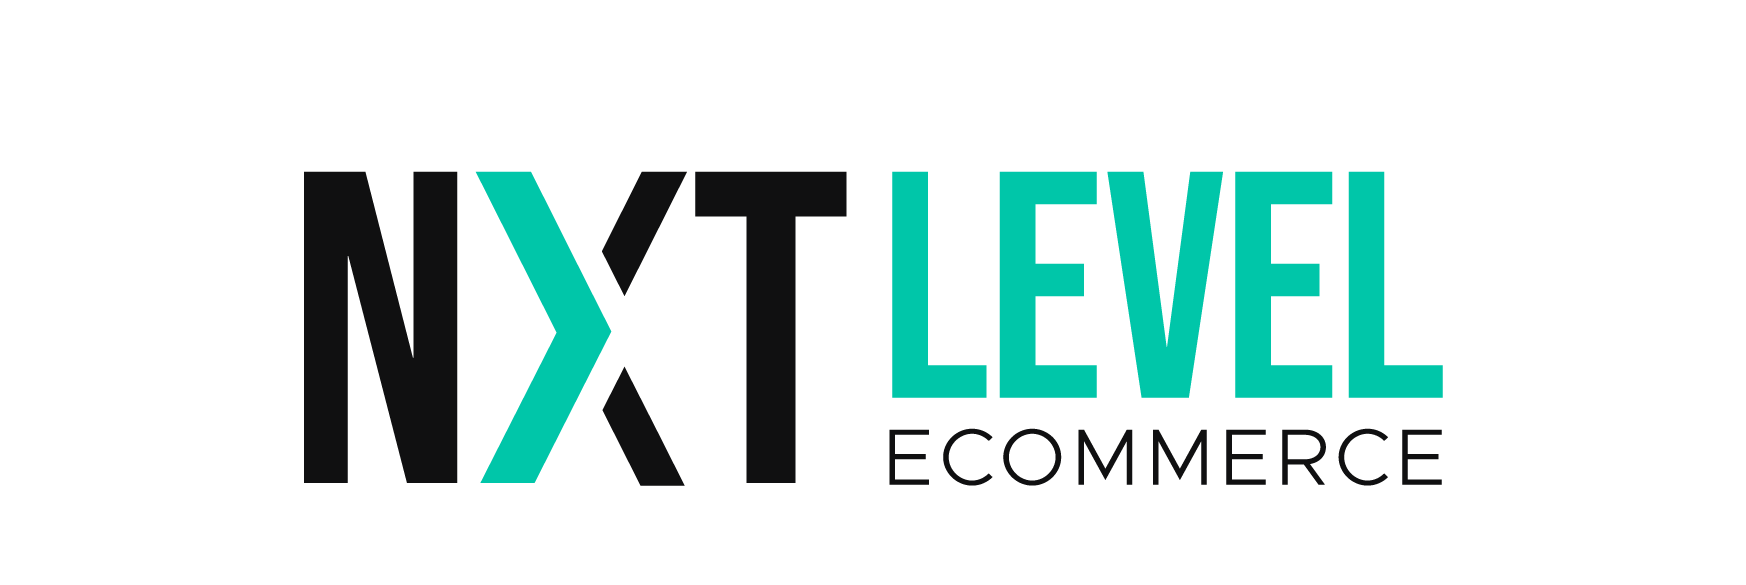 Nxt Level Ecommerce